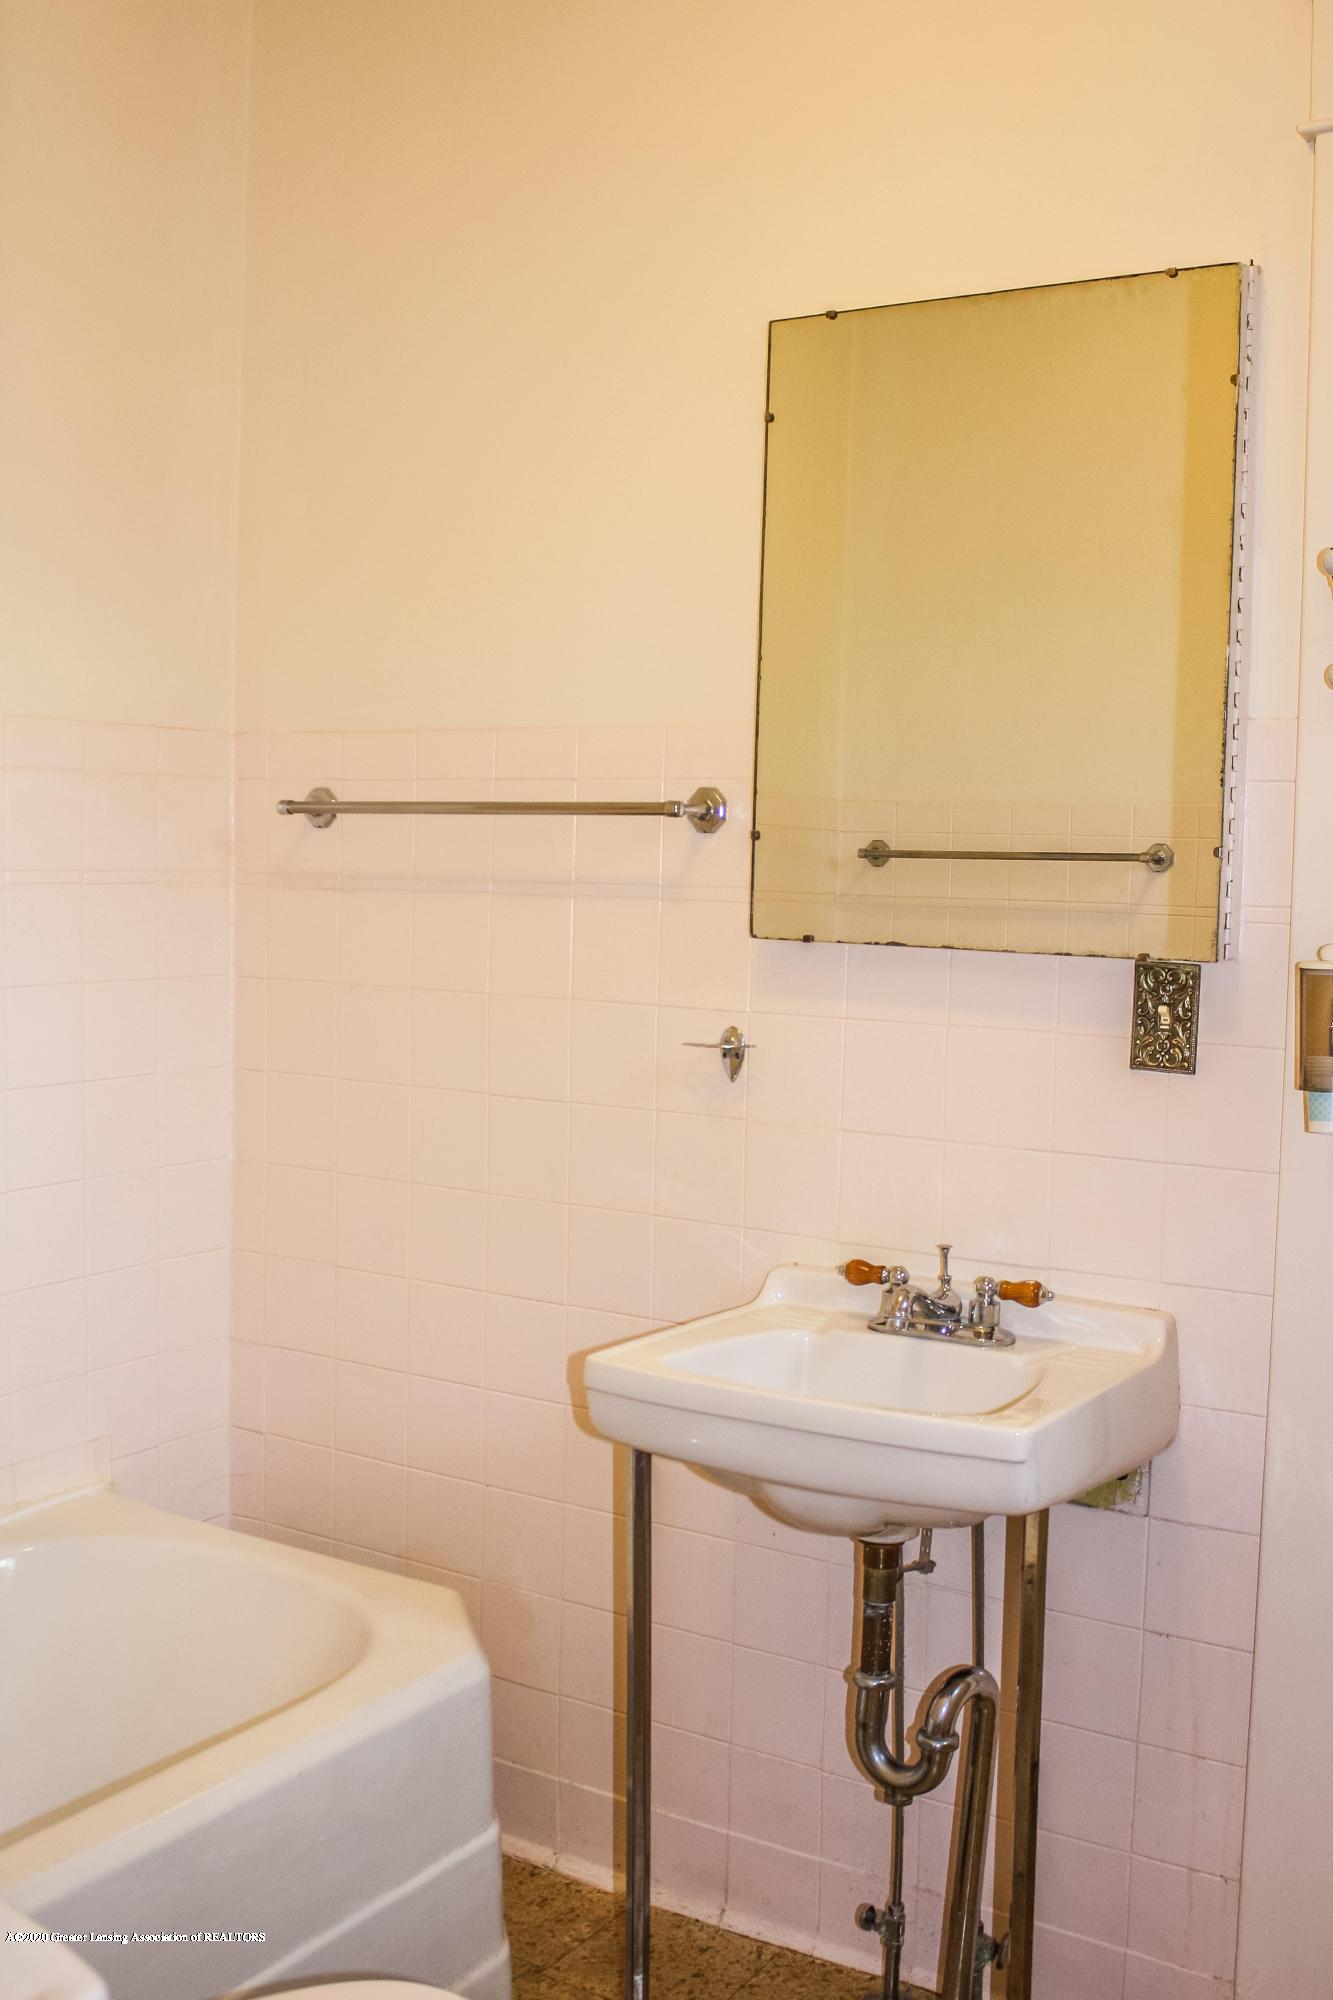 313 S Clemens Ave - Main Floor Bathroom - 17